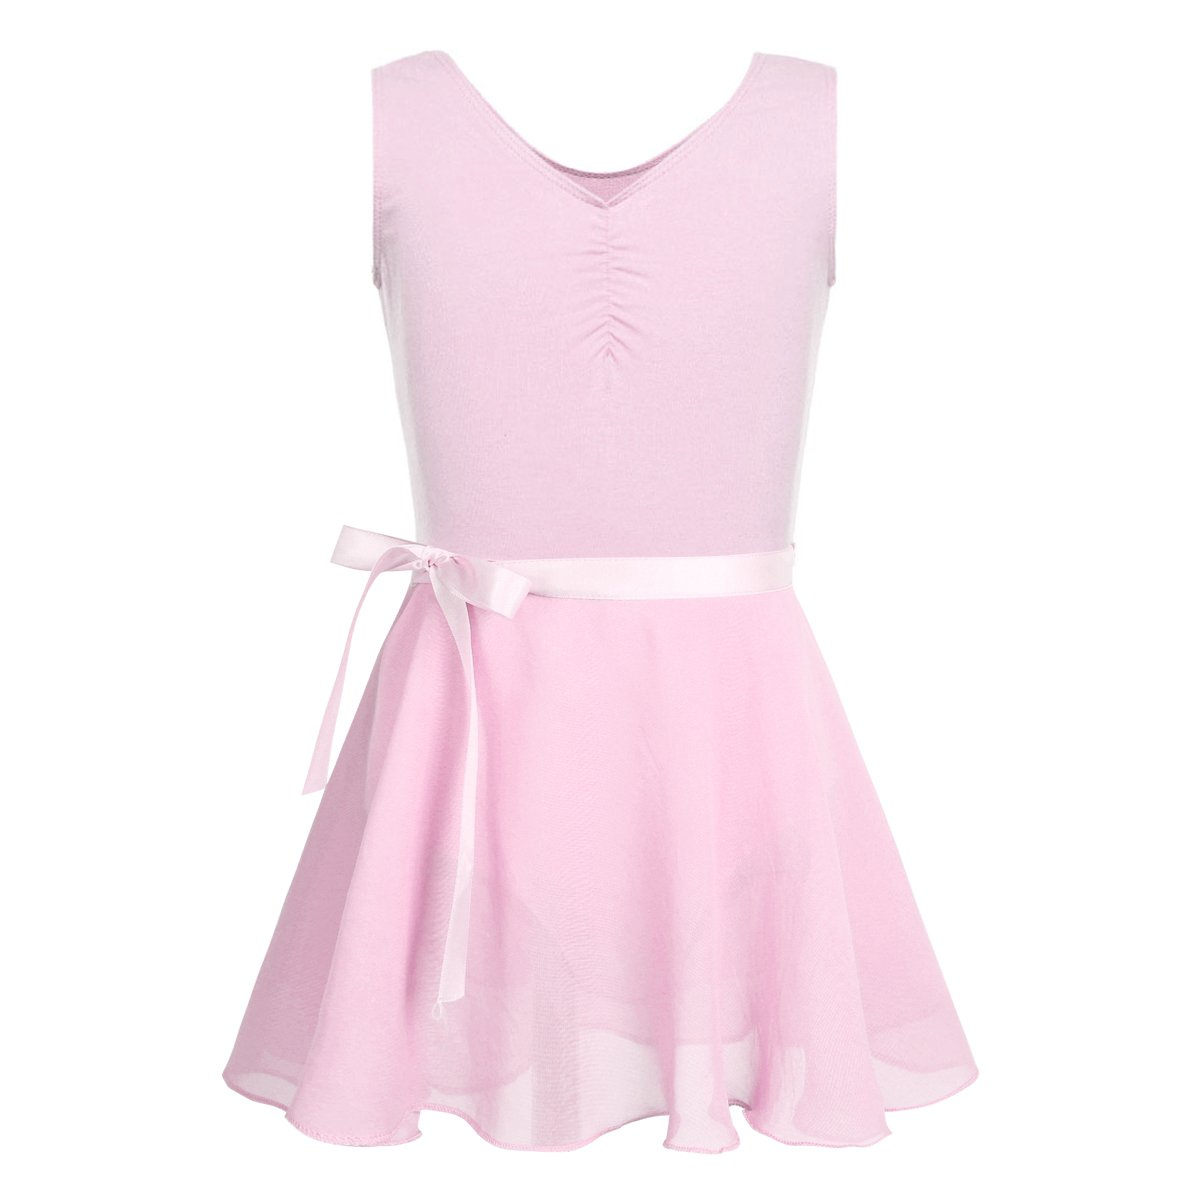 4aa53c6b8 iEFiEL Kids Girls Cotton Short Sleeves Ballet Dance Gymnastics ...